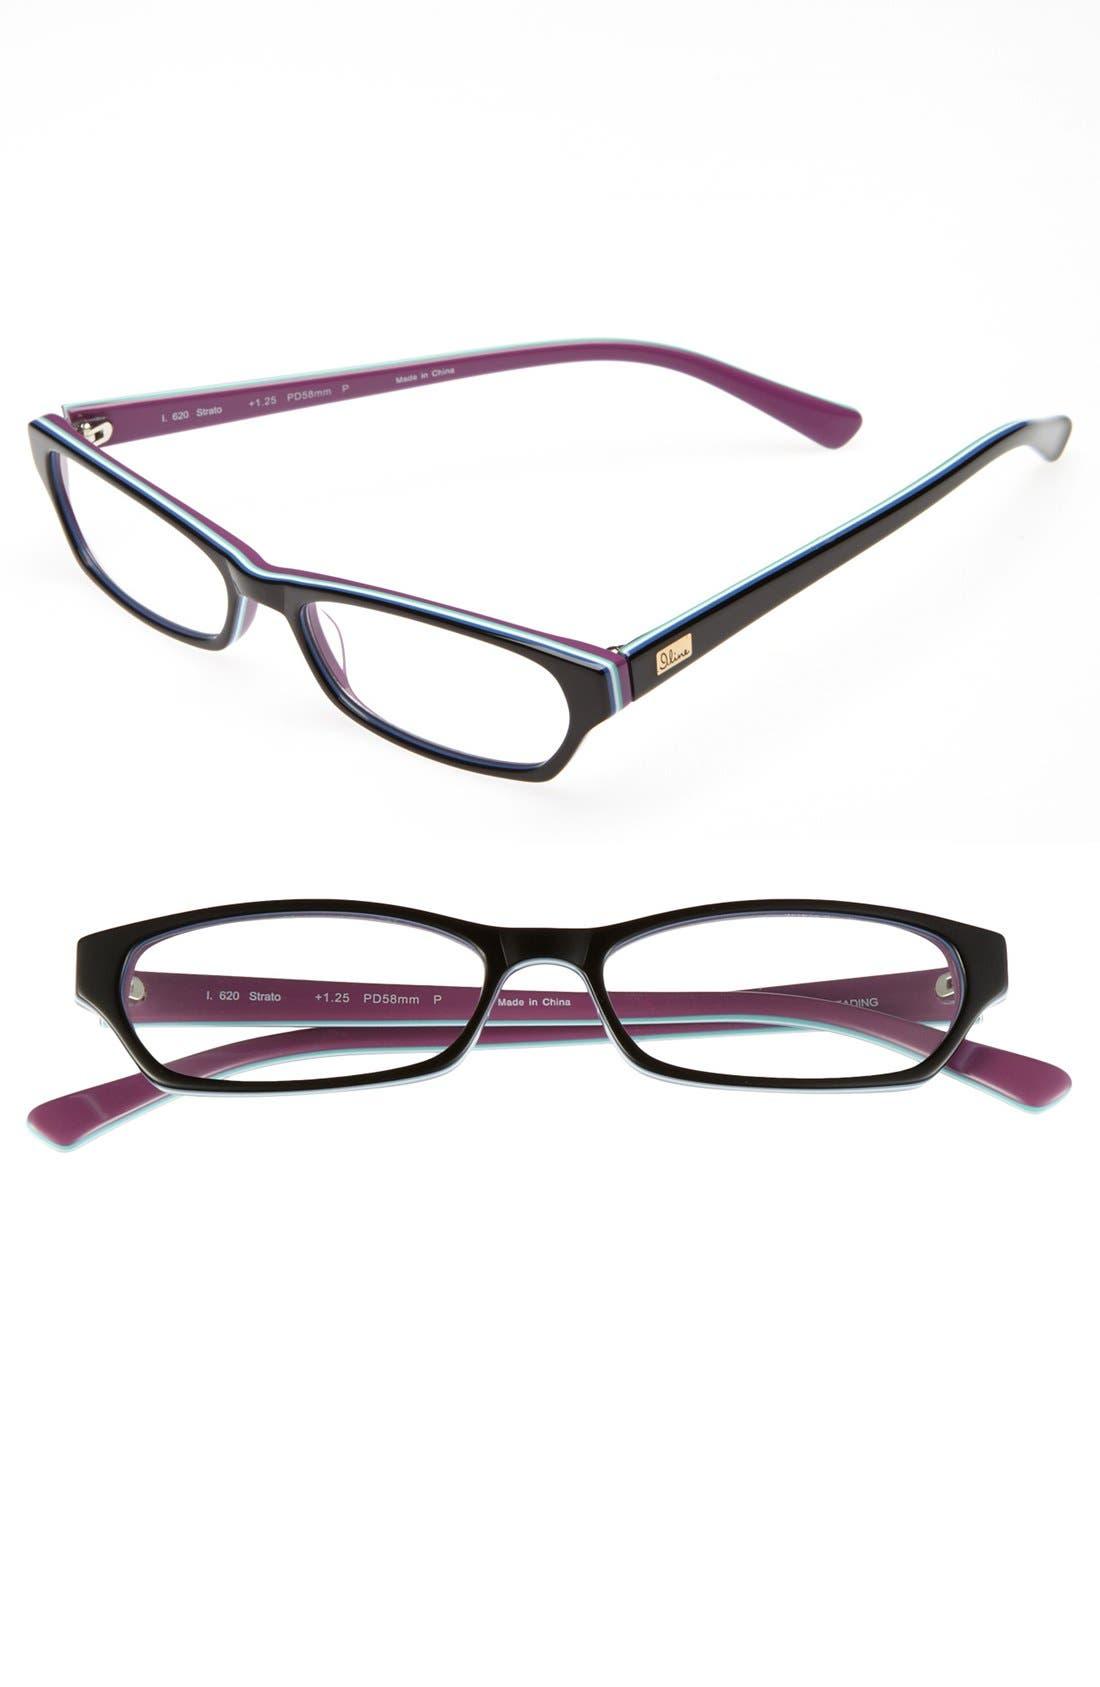 Alternate Image 1 Selected - I Line Eyewear 'Strato' 52mm Reading Glasses